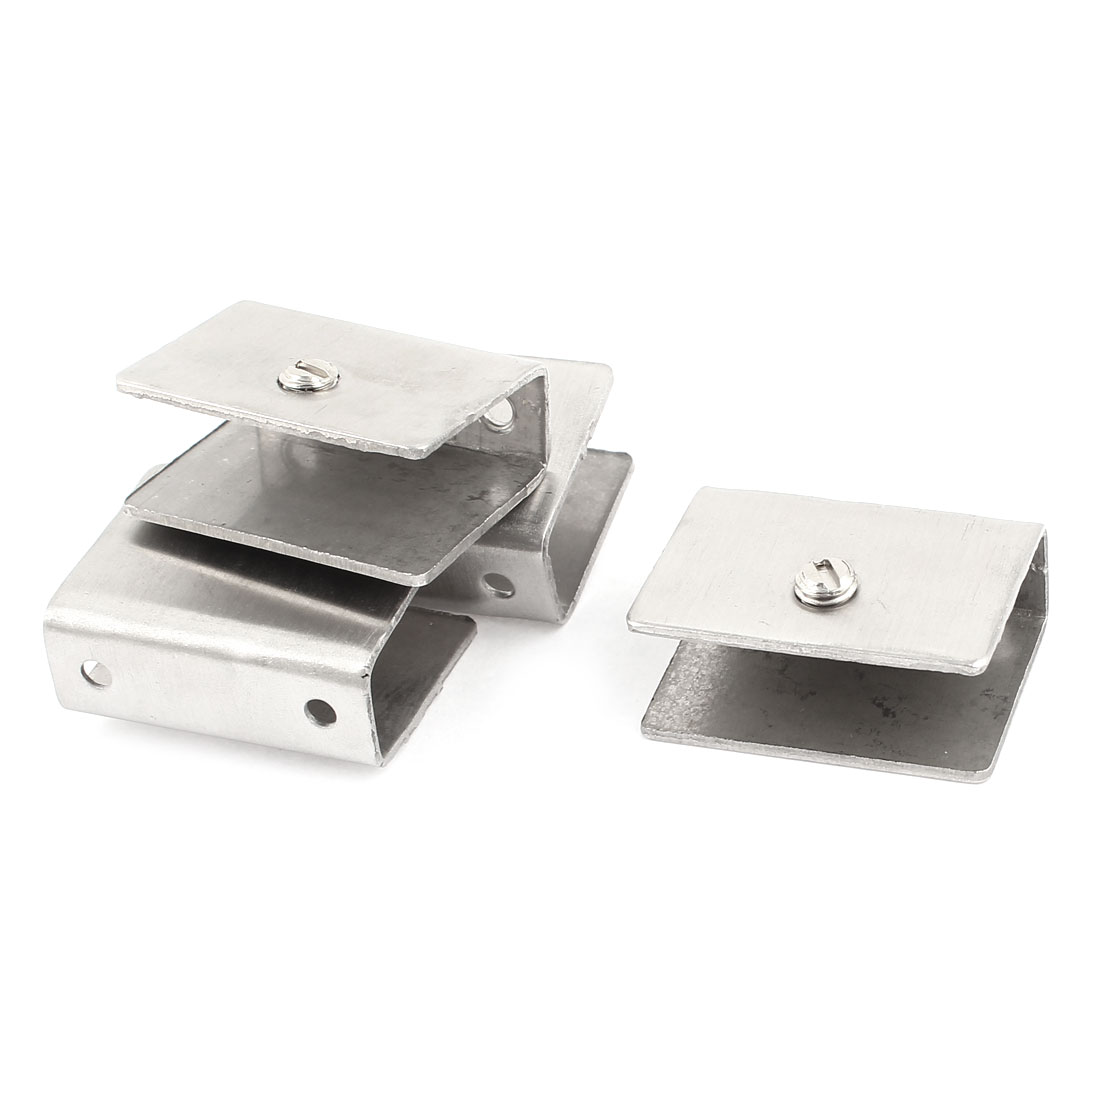 10mm-14mm Thickness Rectangular Shelf Glass Clip Clamp Silver Tone 4 Pcs